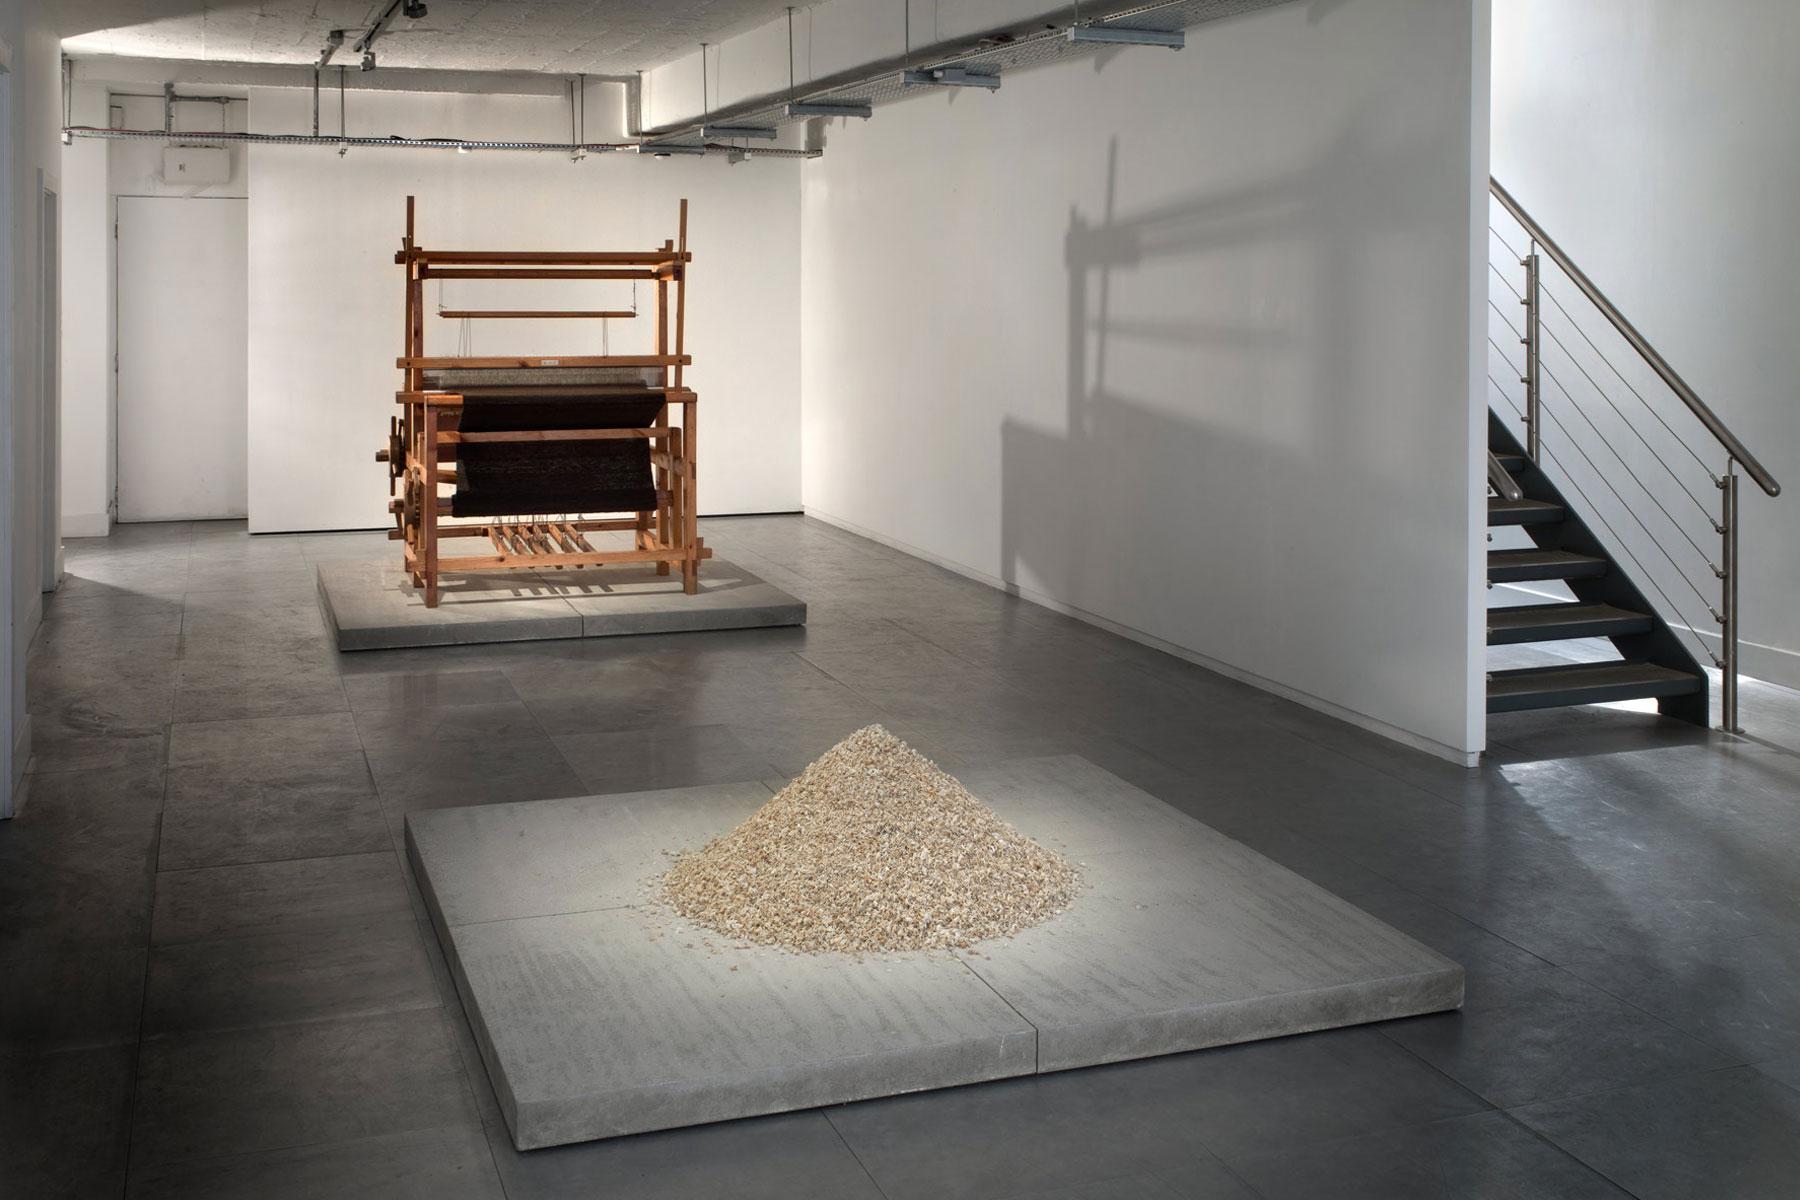 Untitled (+/-), 2009